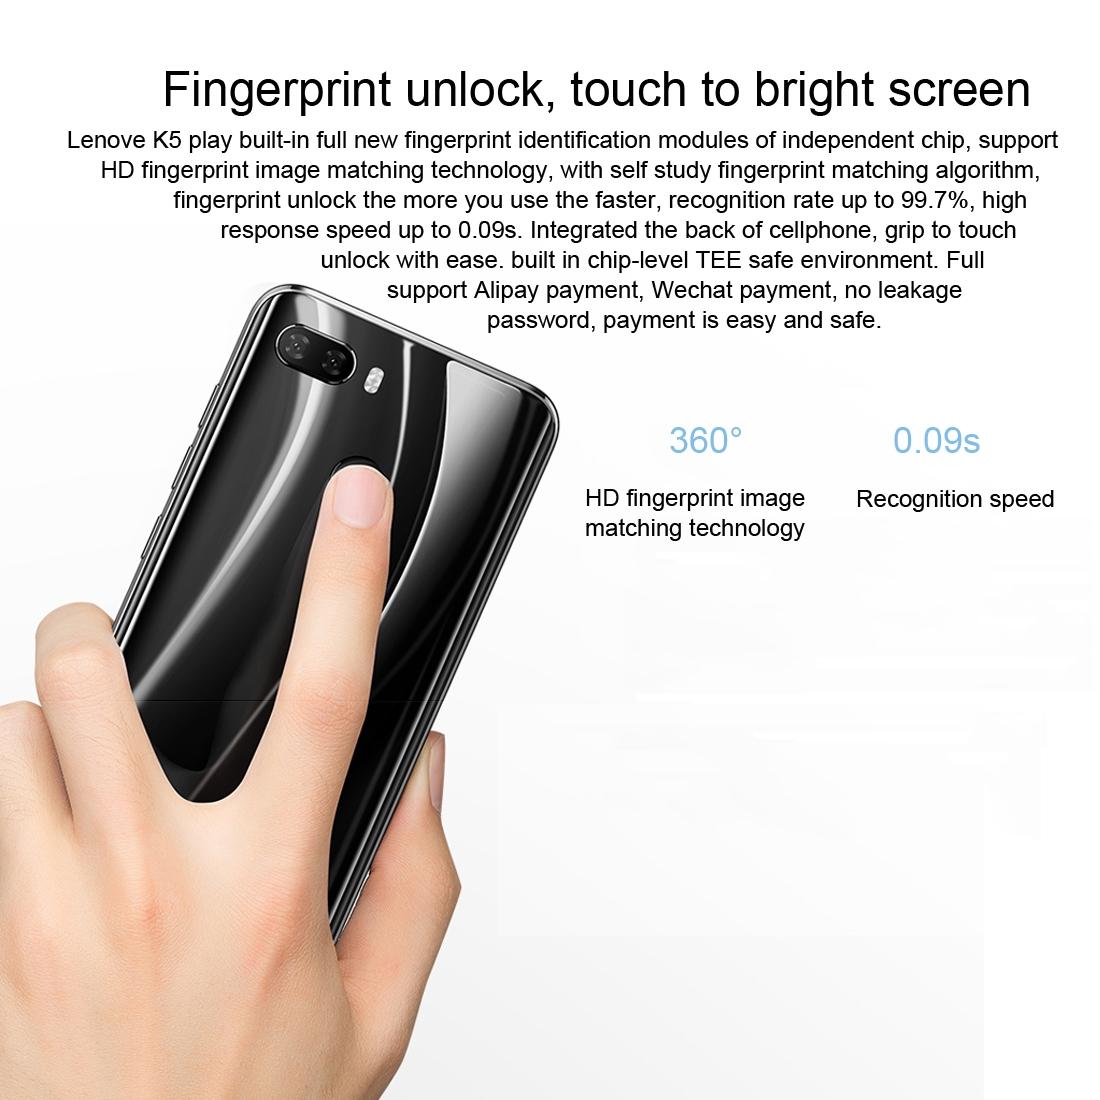 i.ibb.co/L9vJhr2/Smartphone-3-GB-32-GB-Jogo-Lenovo-K5-Play-Azul-8.jpg